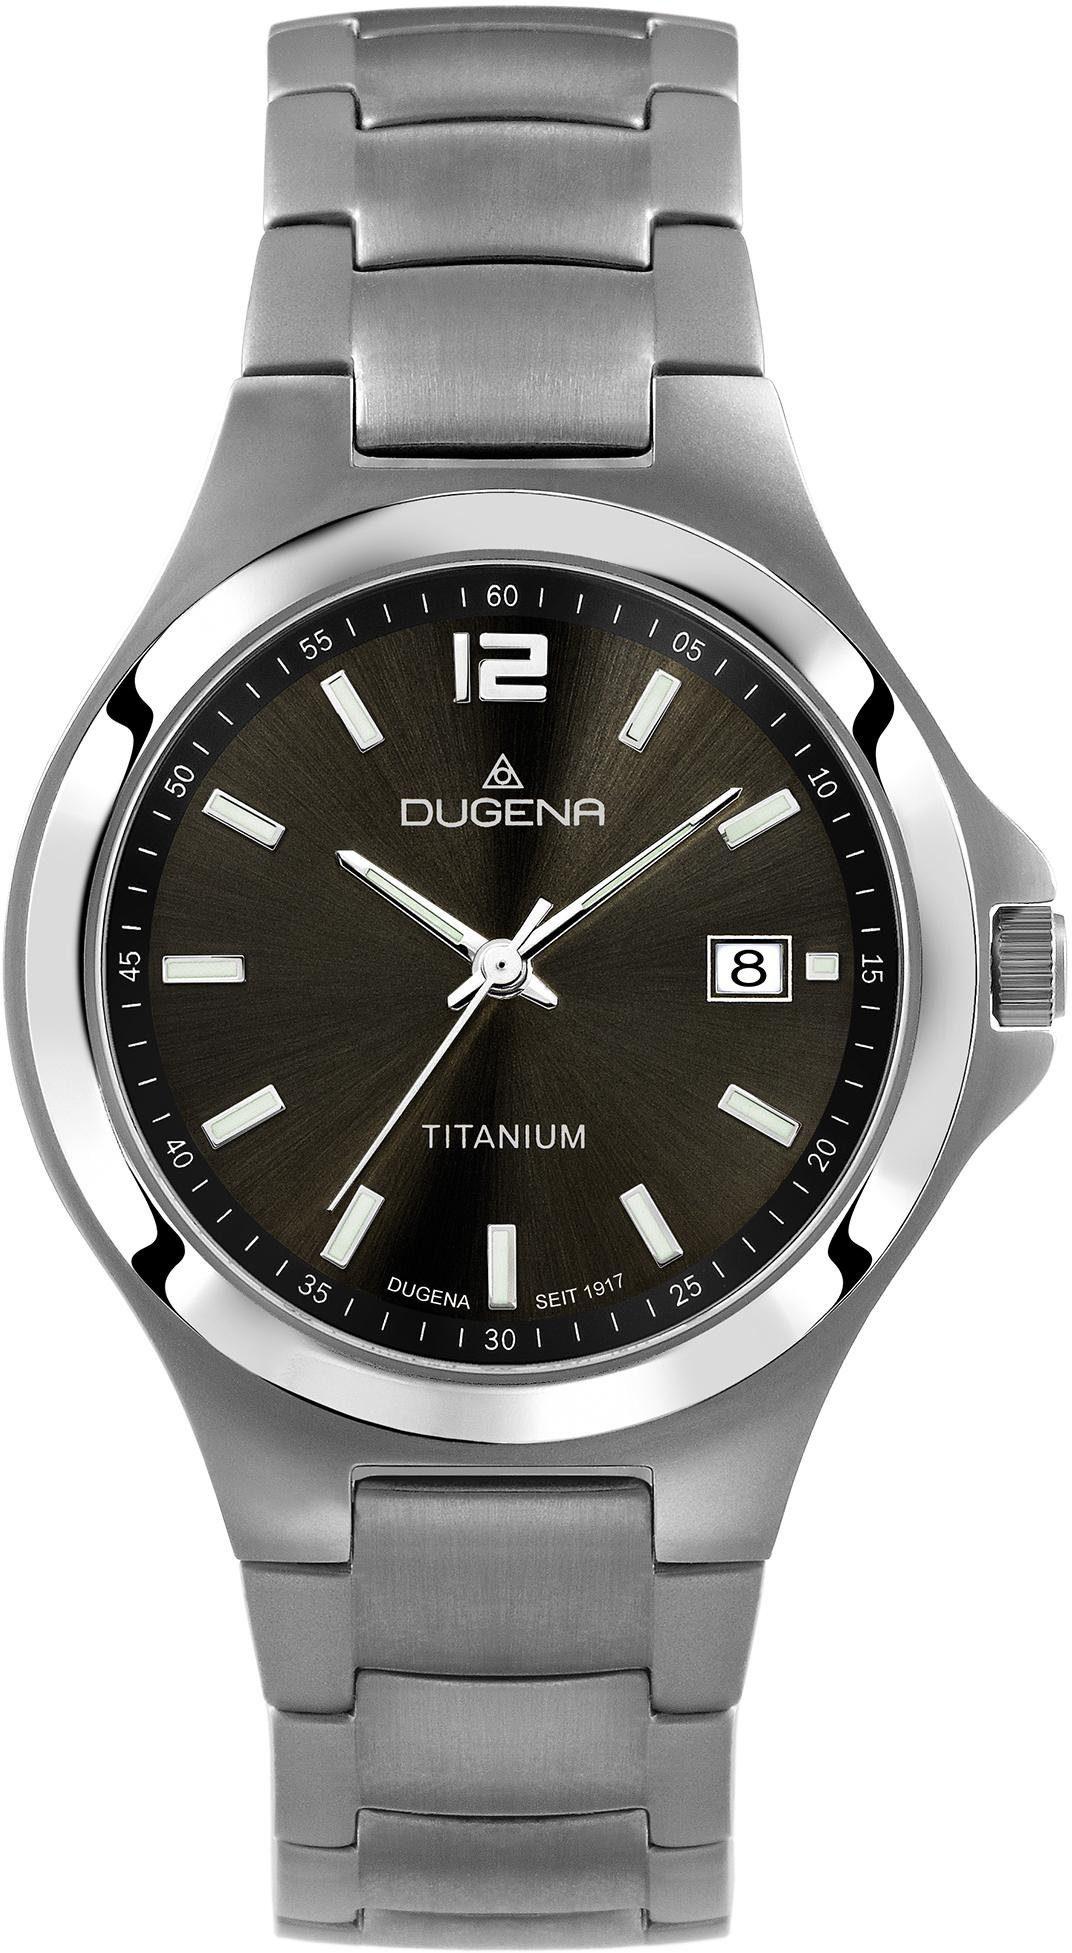 Dugena Titanuhr Titanuhr, 4460531   Uhren > Titanuhren   Dugena